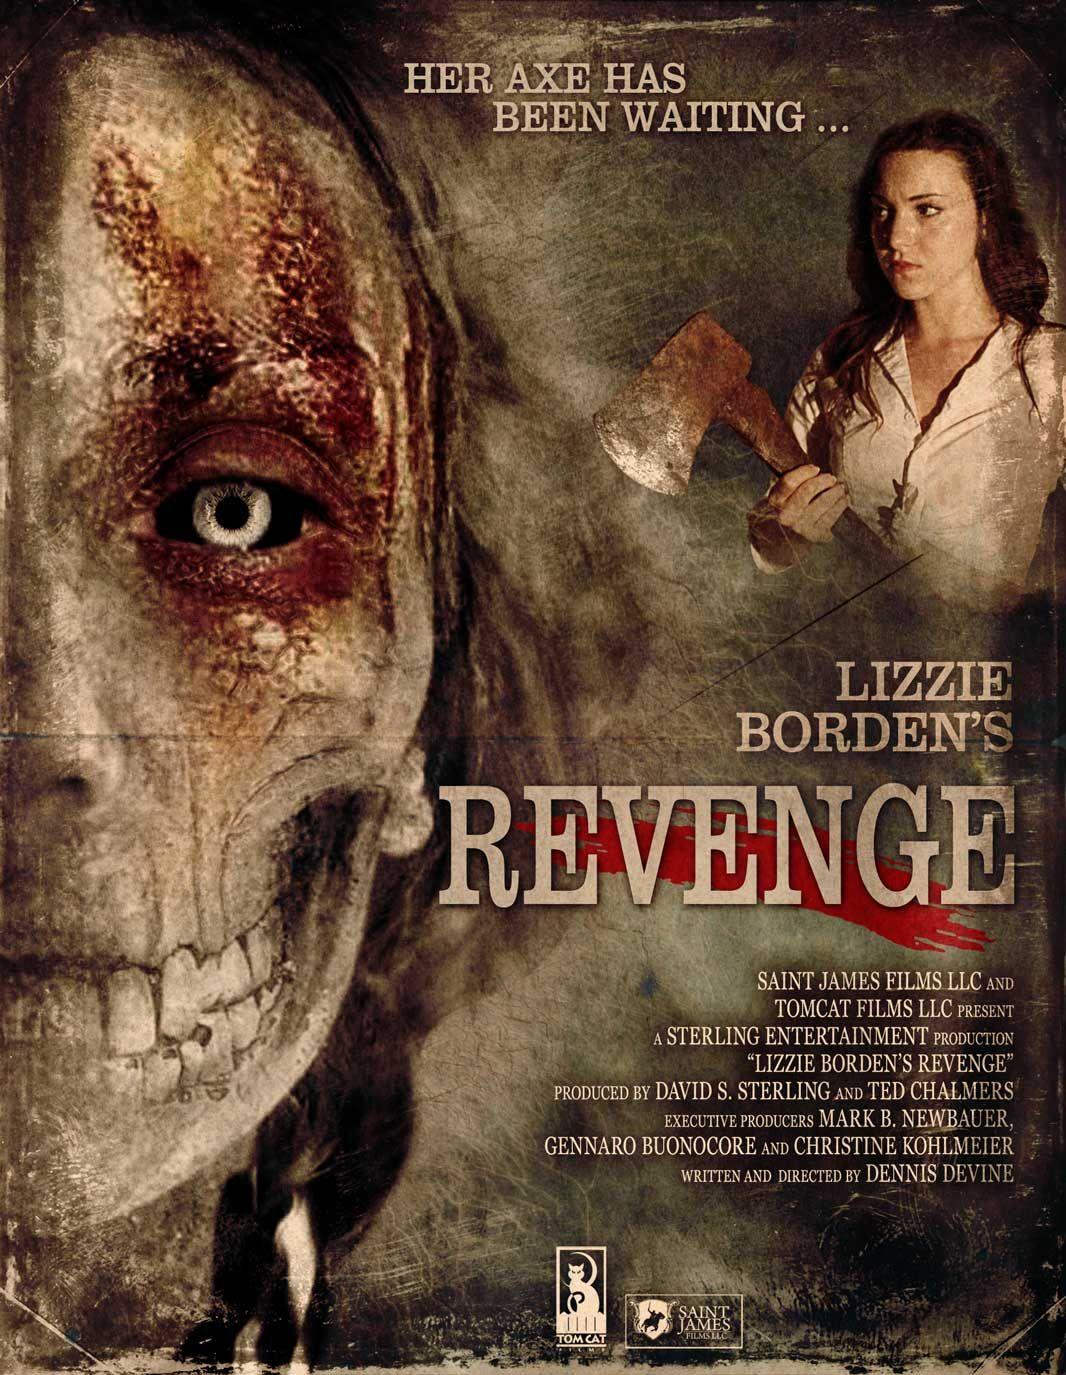 watch online lizzie bordens revenge 2012 full movie